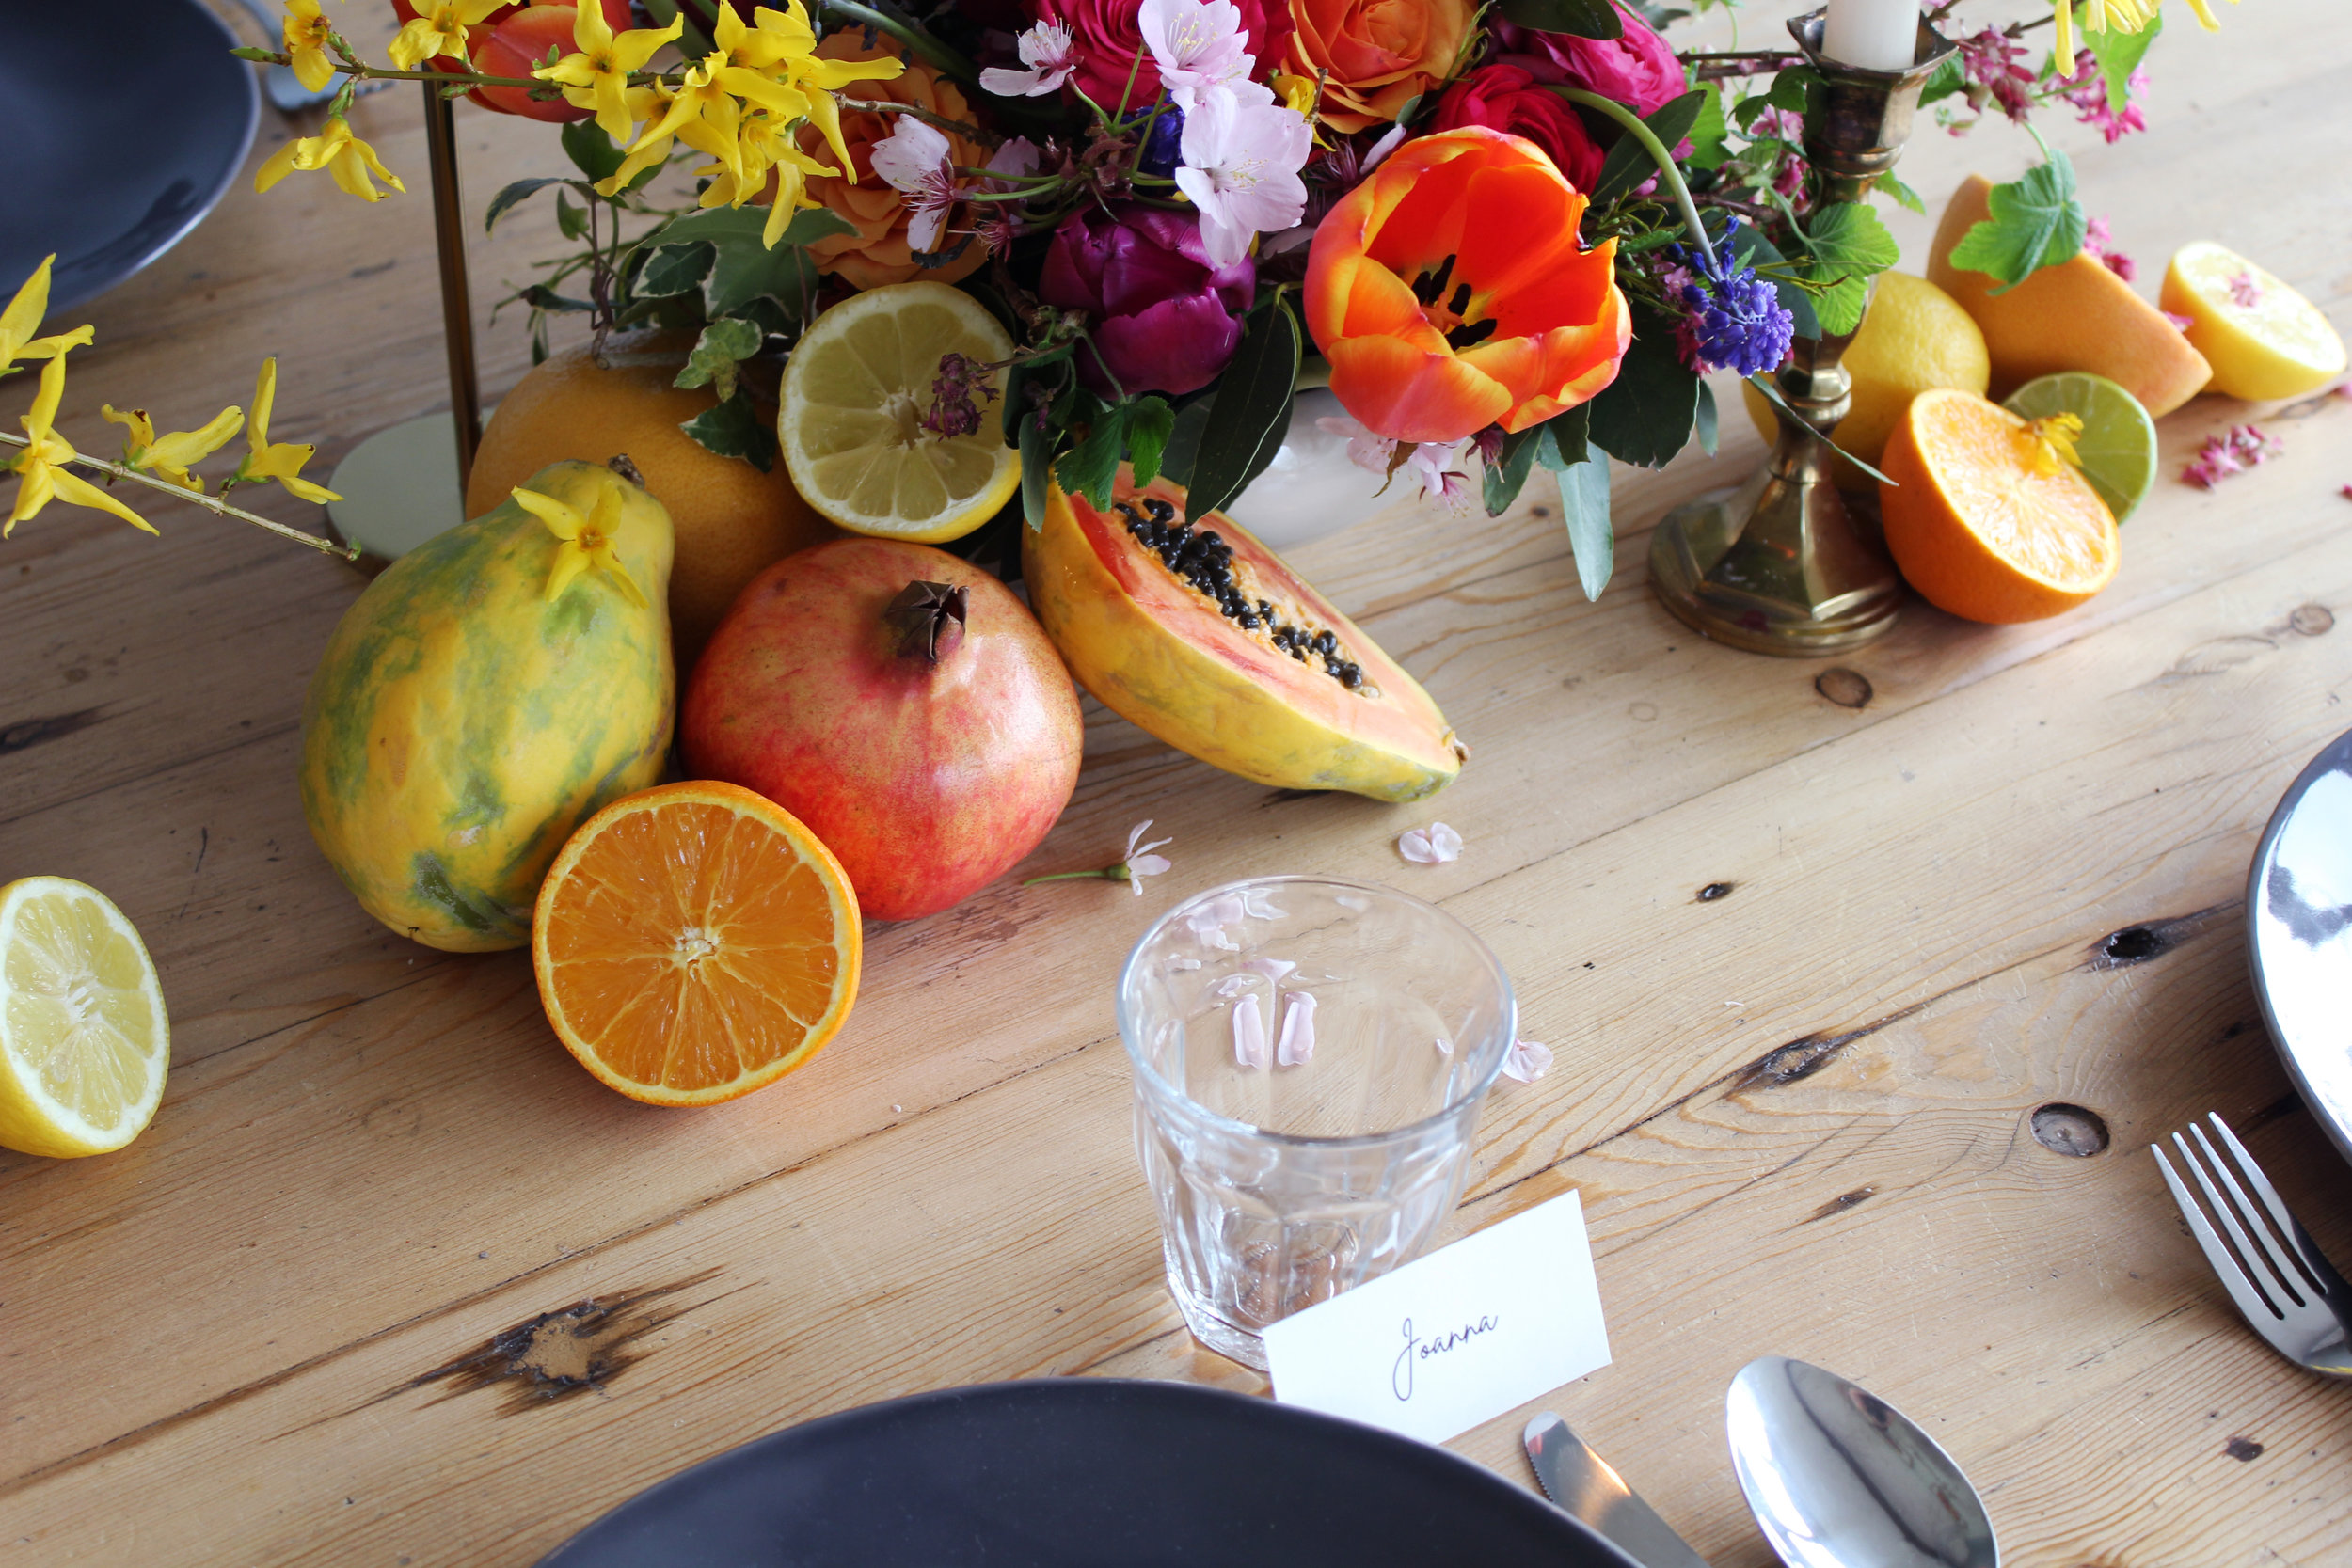 Callie-Pettigrew-Fruity-Florals-2.jpg